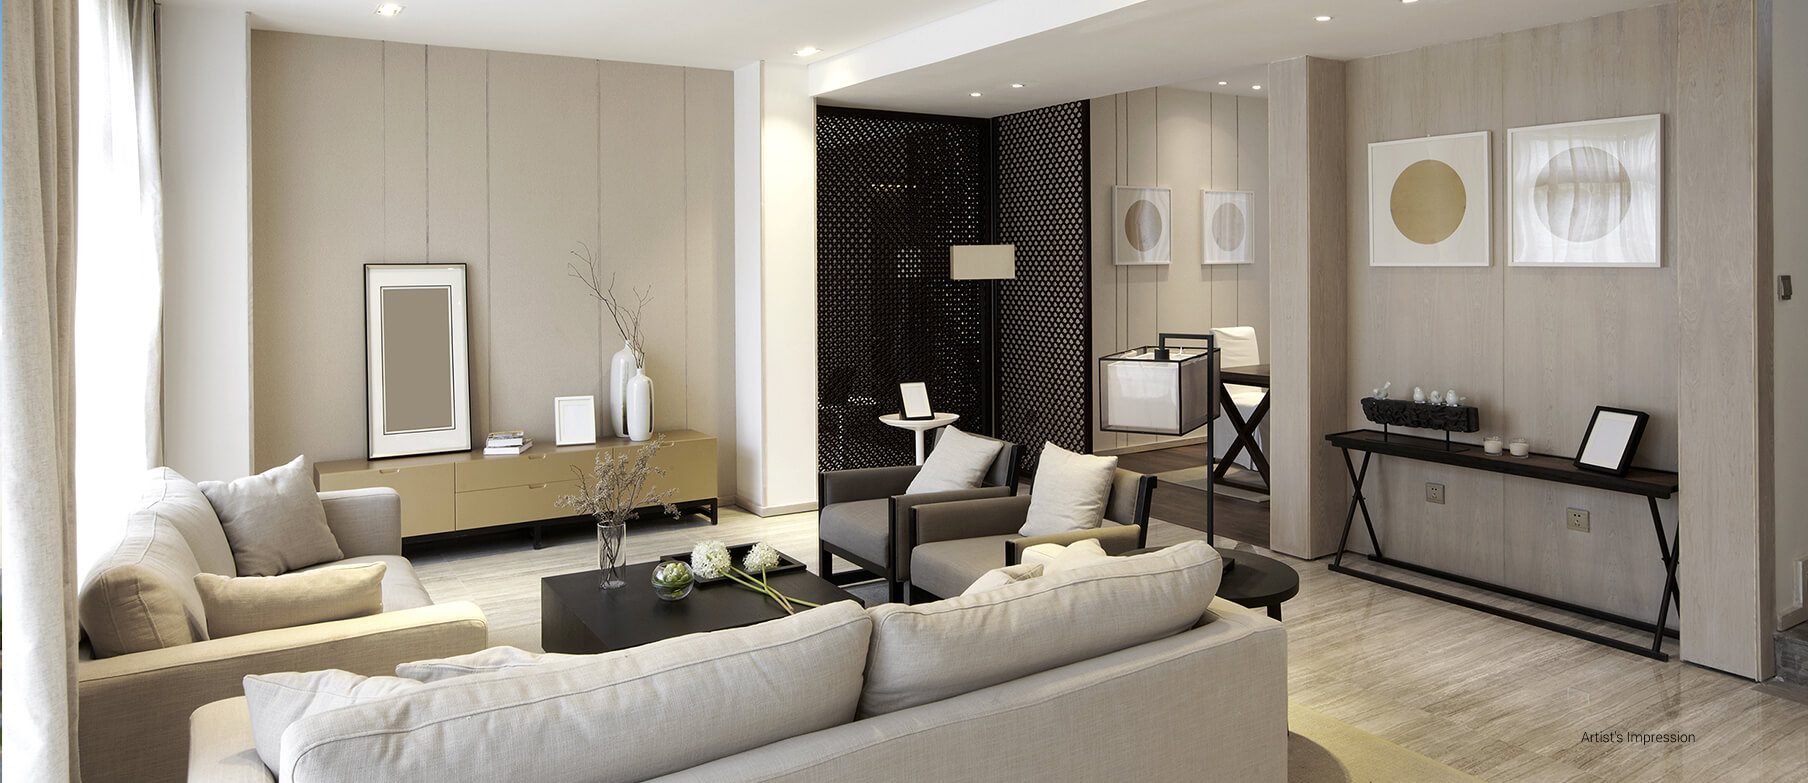 akshar elita amenities features8